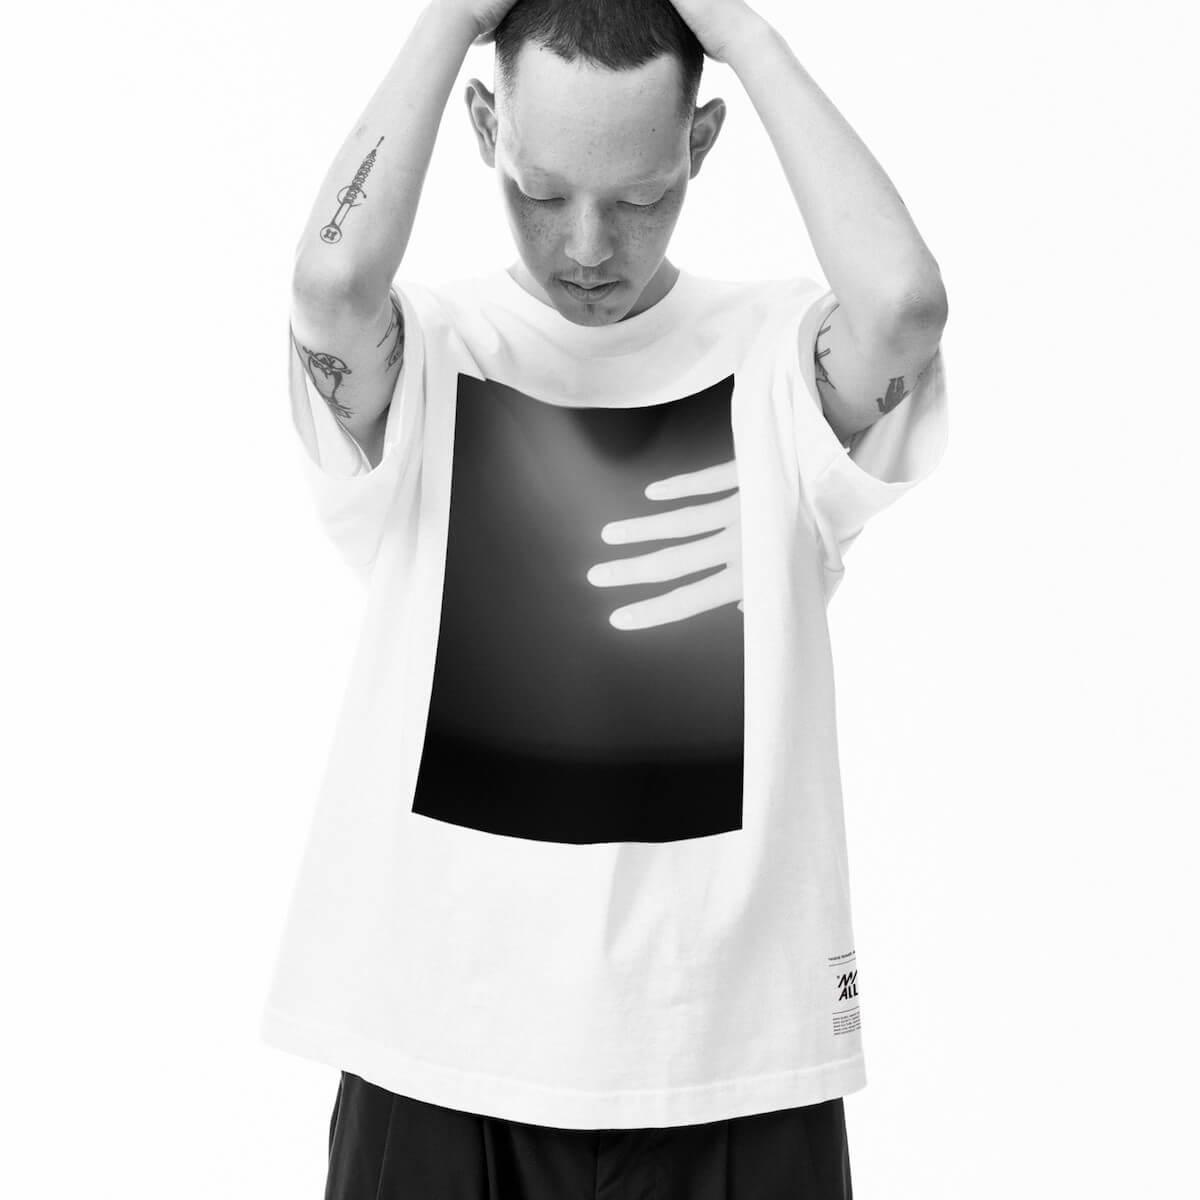 "<THE M/ALL>、""100 VOTE T−Shirts PROJECT""の第四弾マヒトゥ・ザ・ピーポーとのコラボTシャツ全9種類が販売開始! musix190520the-m-all_5"